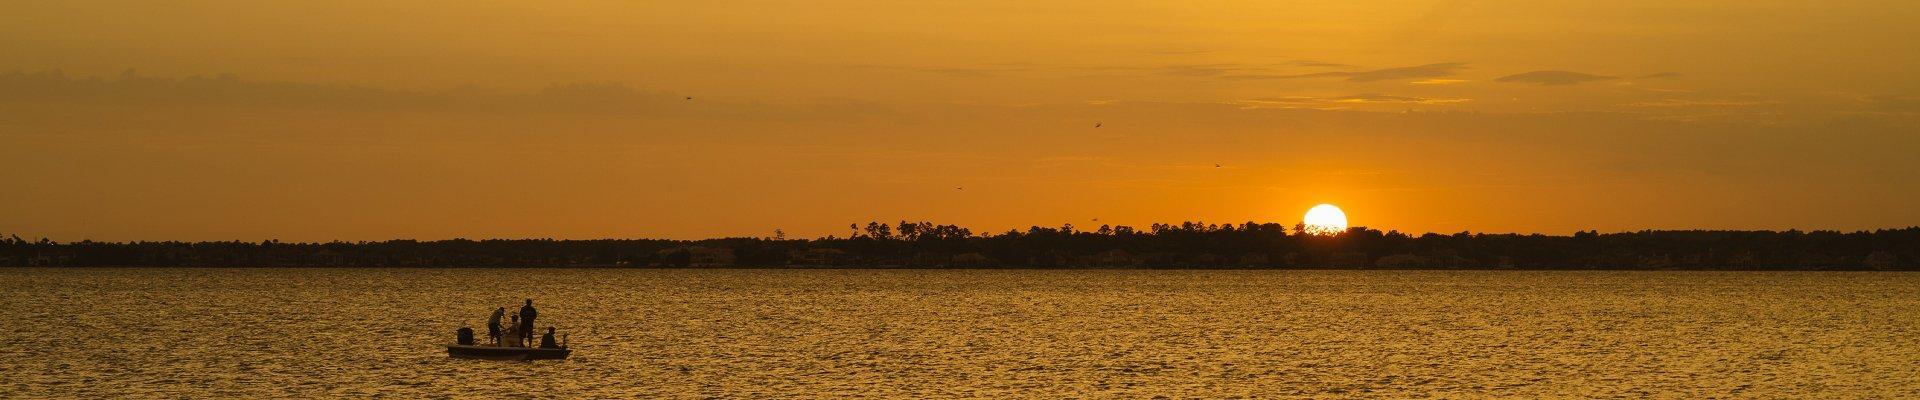 sunset of conroe texas